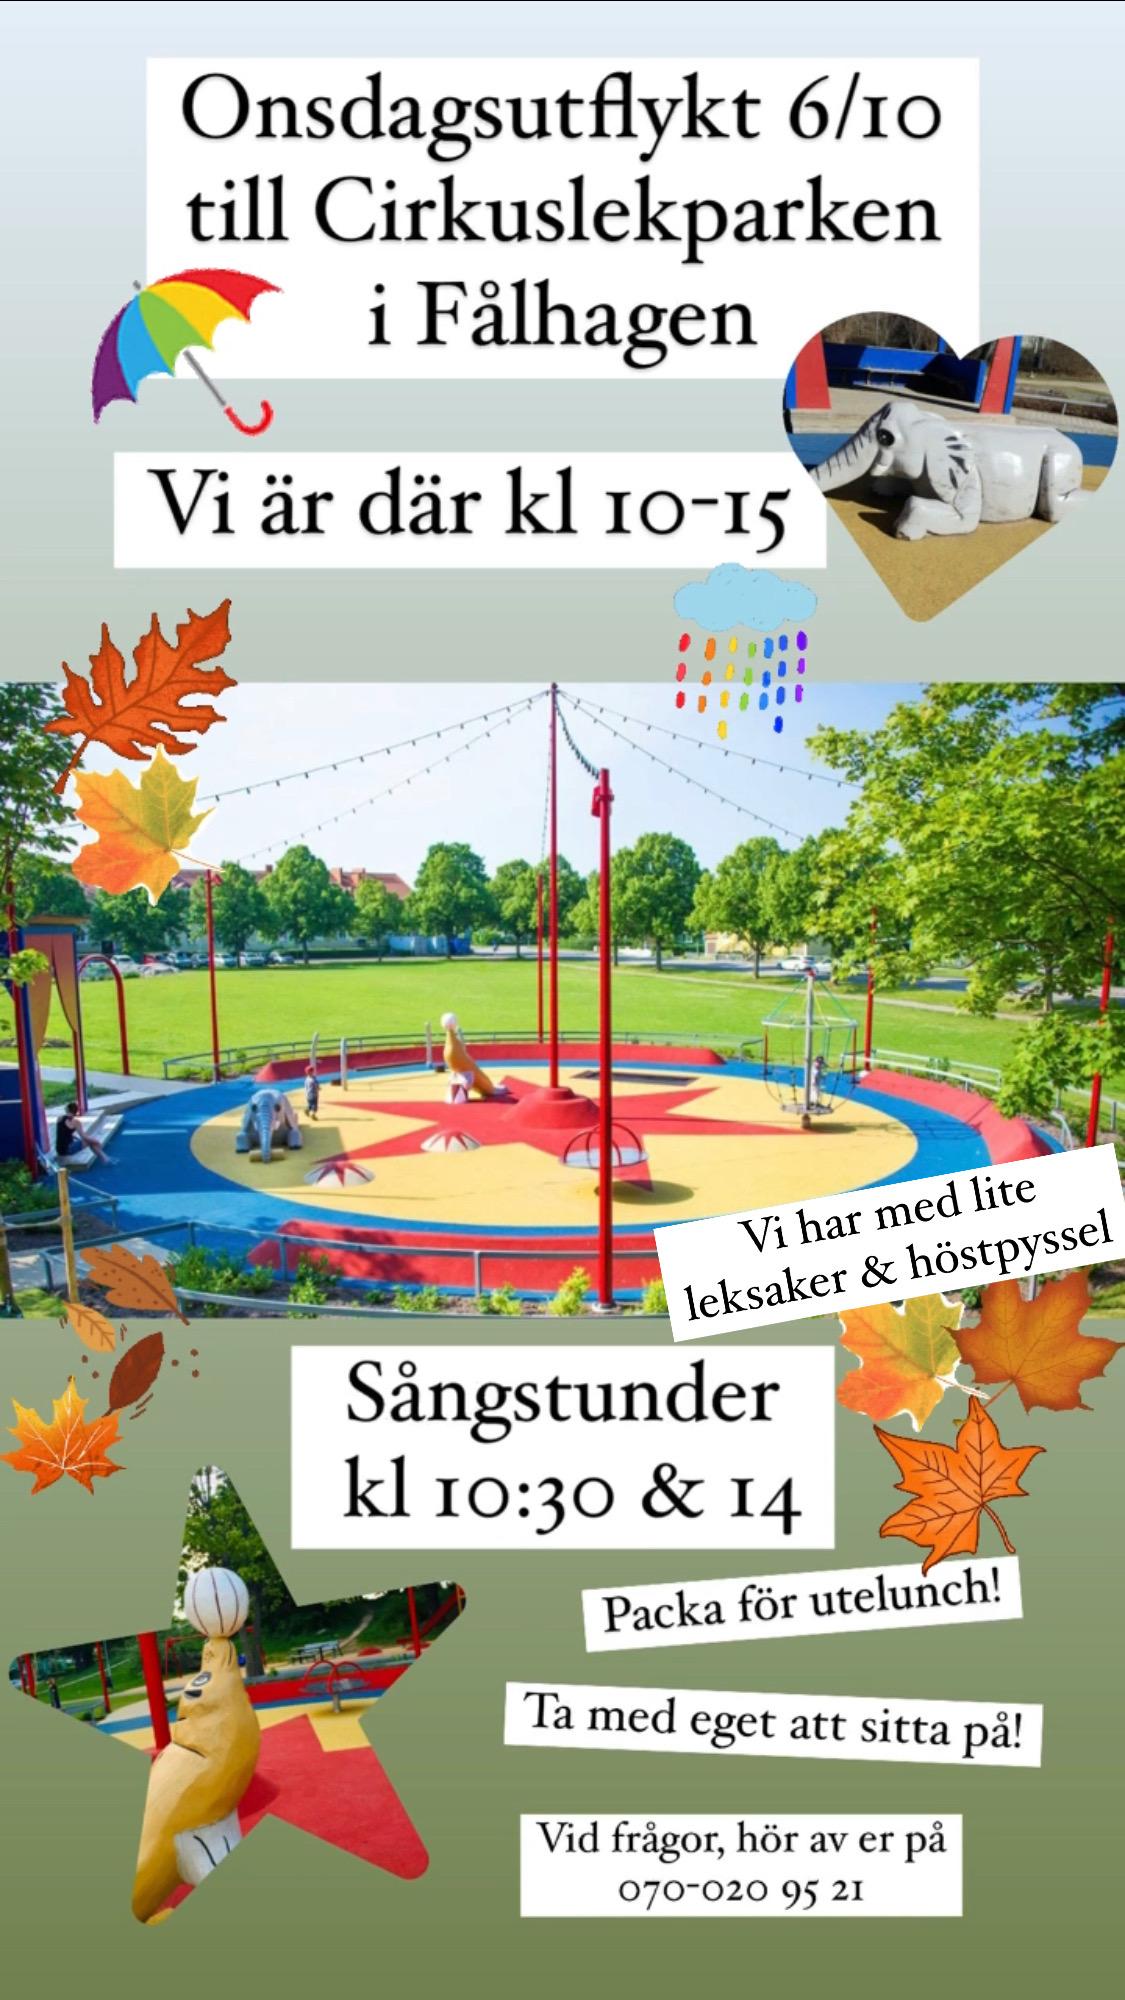 You are currently viewing 🍂 Onsdagsutflykt till Cirkuslekparken 6/10 🎪